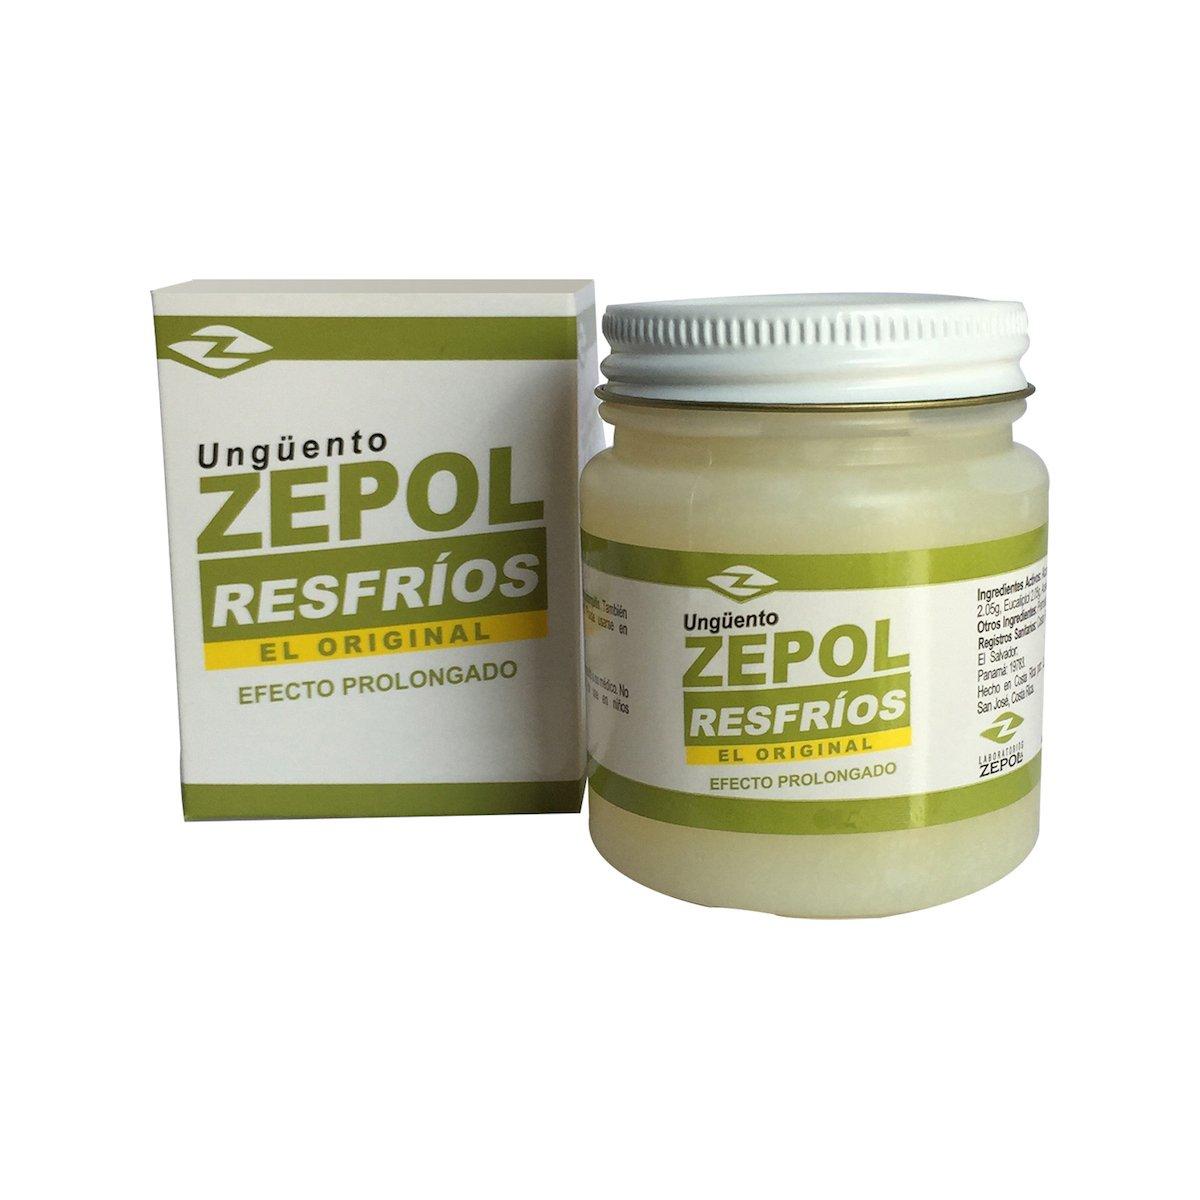 Zepol Ointment Colds - 2.1 Oz - 2 Pack by Zepol